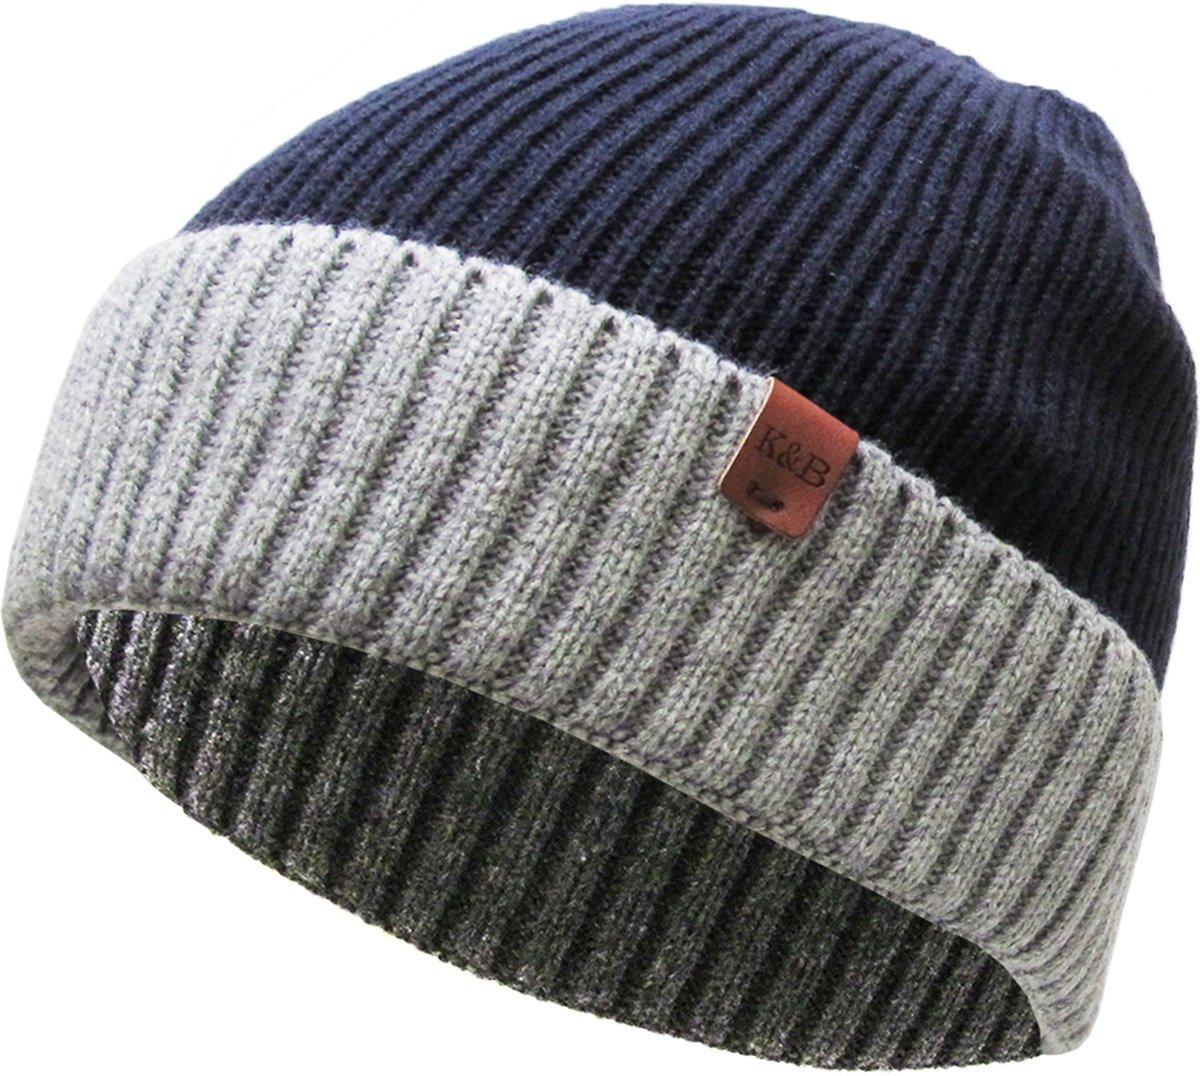 KBETHOS HAT メンズ B0741B9MPB One Size (264) Navy/Light Gray (264) Navy/Light Gray One Size